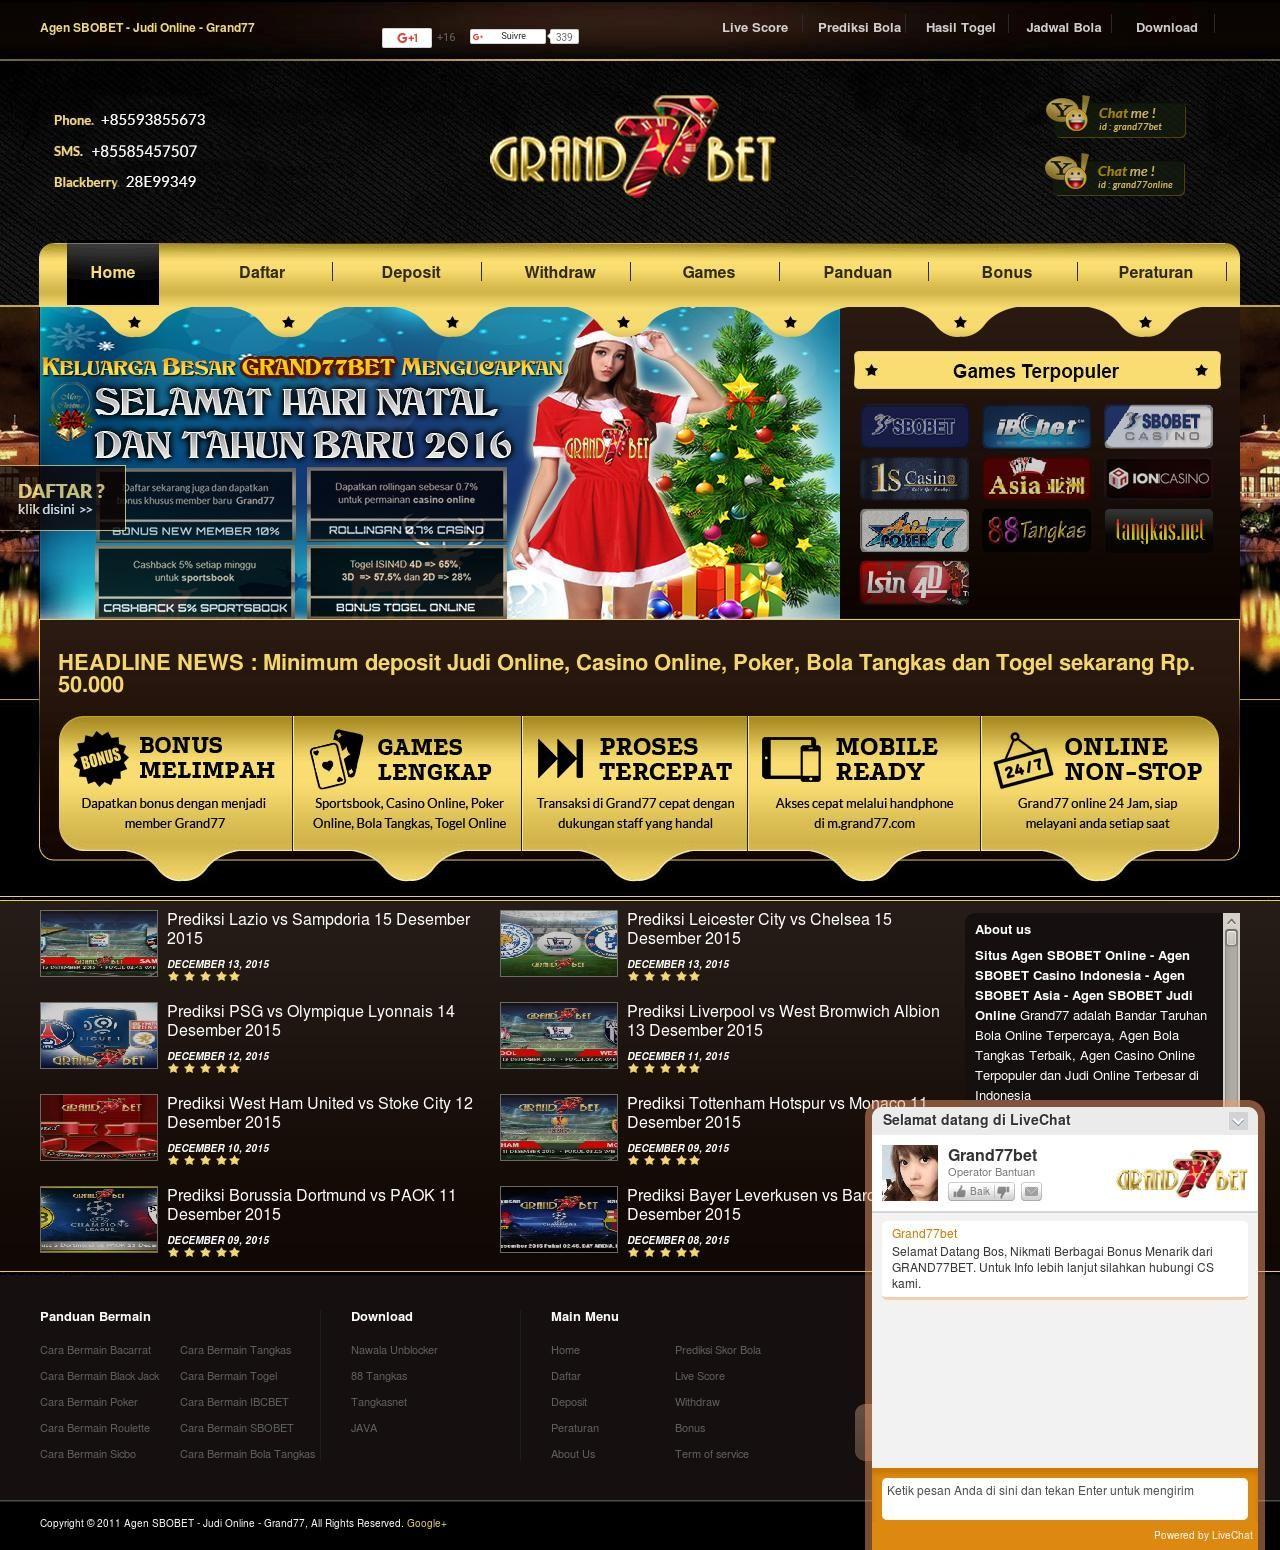 Agen Sbobet Provide Manufacturing Accounts Soccer Betting Casino Gambling Online Poker And Toggle Fielding Balls Online Http A Online Poker Agen Gambling